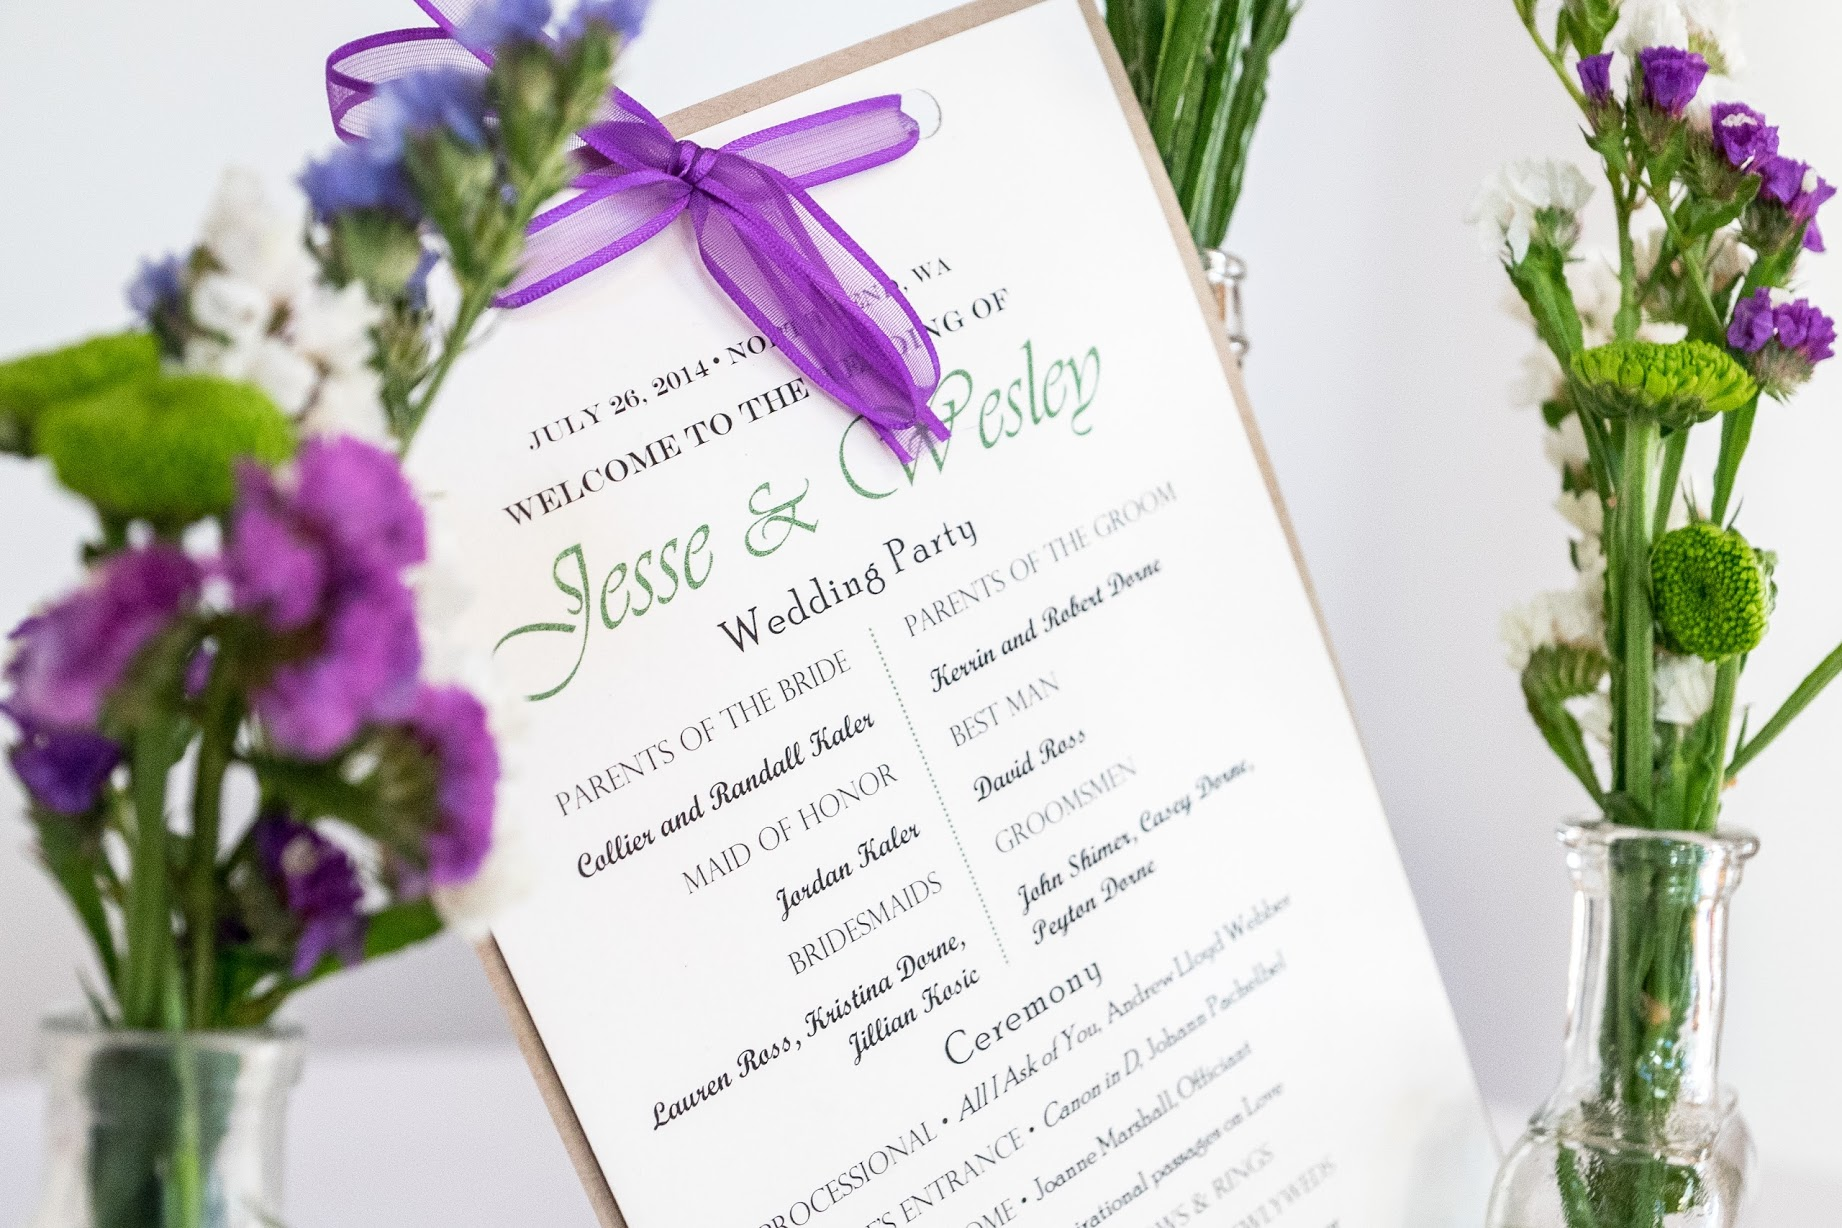 Ceremony Programs with green font and royal purple ribbon | Meadowbrook Farm Wedding, Snoqualmie, WA | Perfectly Posh Events, Seattle Wedding Planner | Sasha Reiko Photography | Jesse + Wes Wedding // © Sasha Reiko Photography